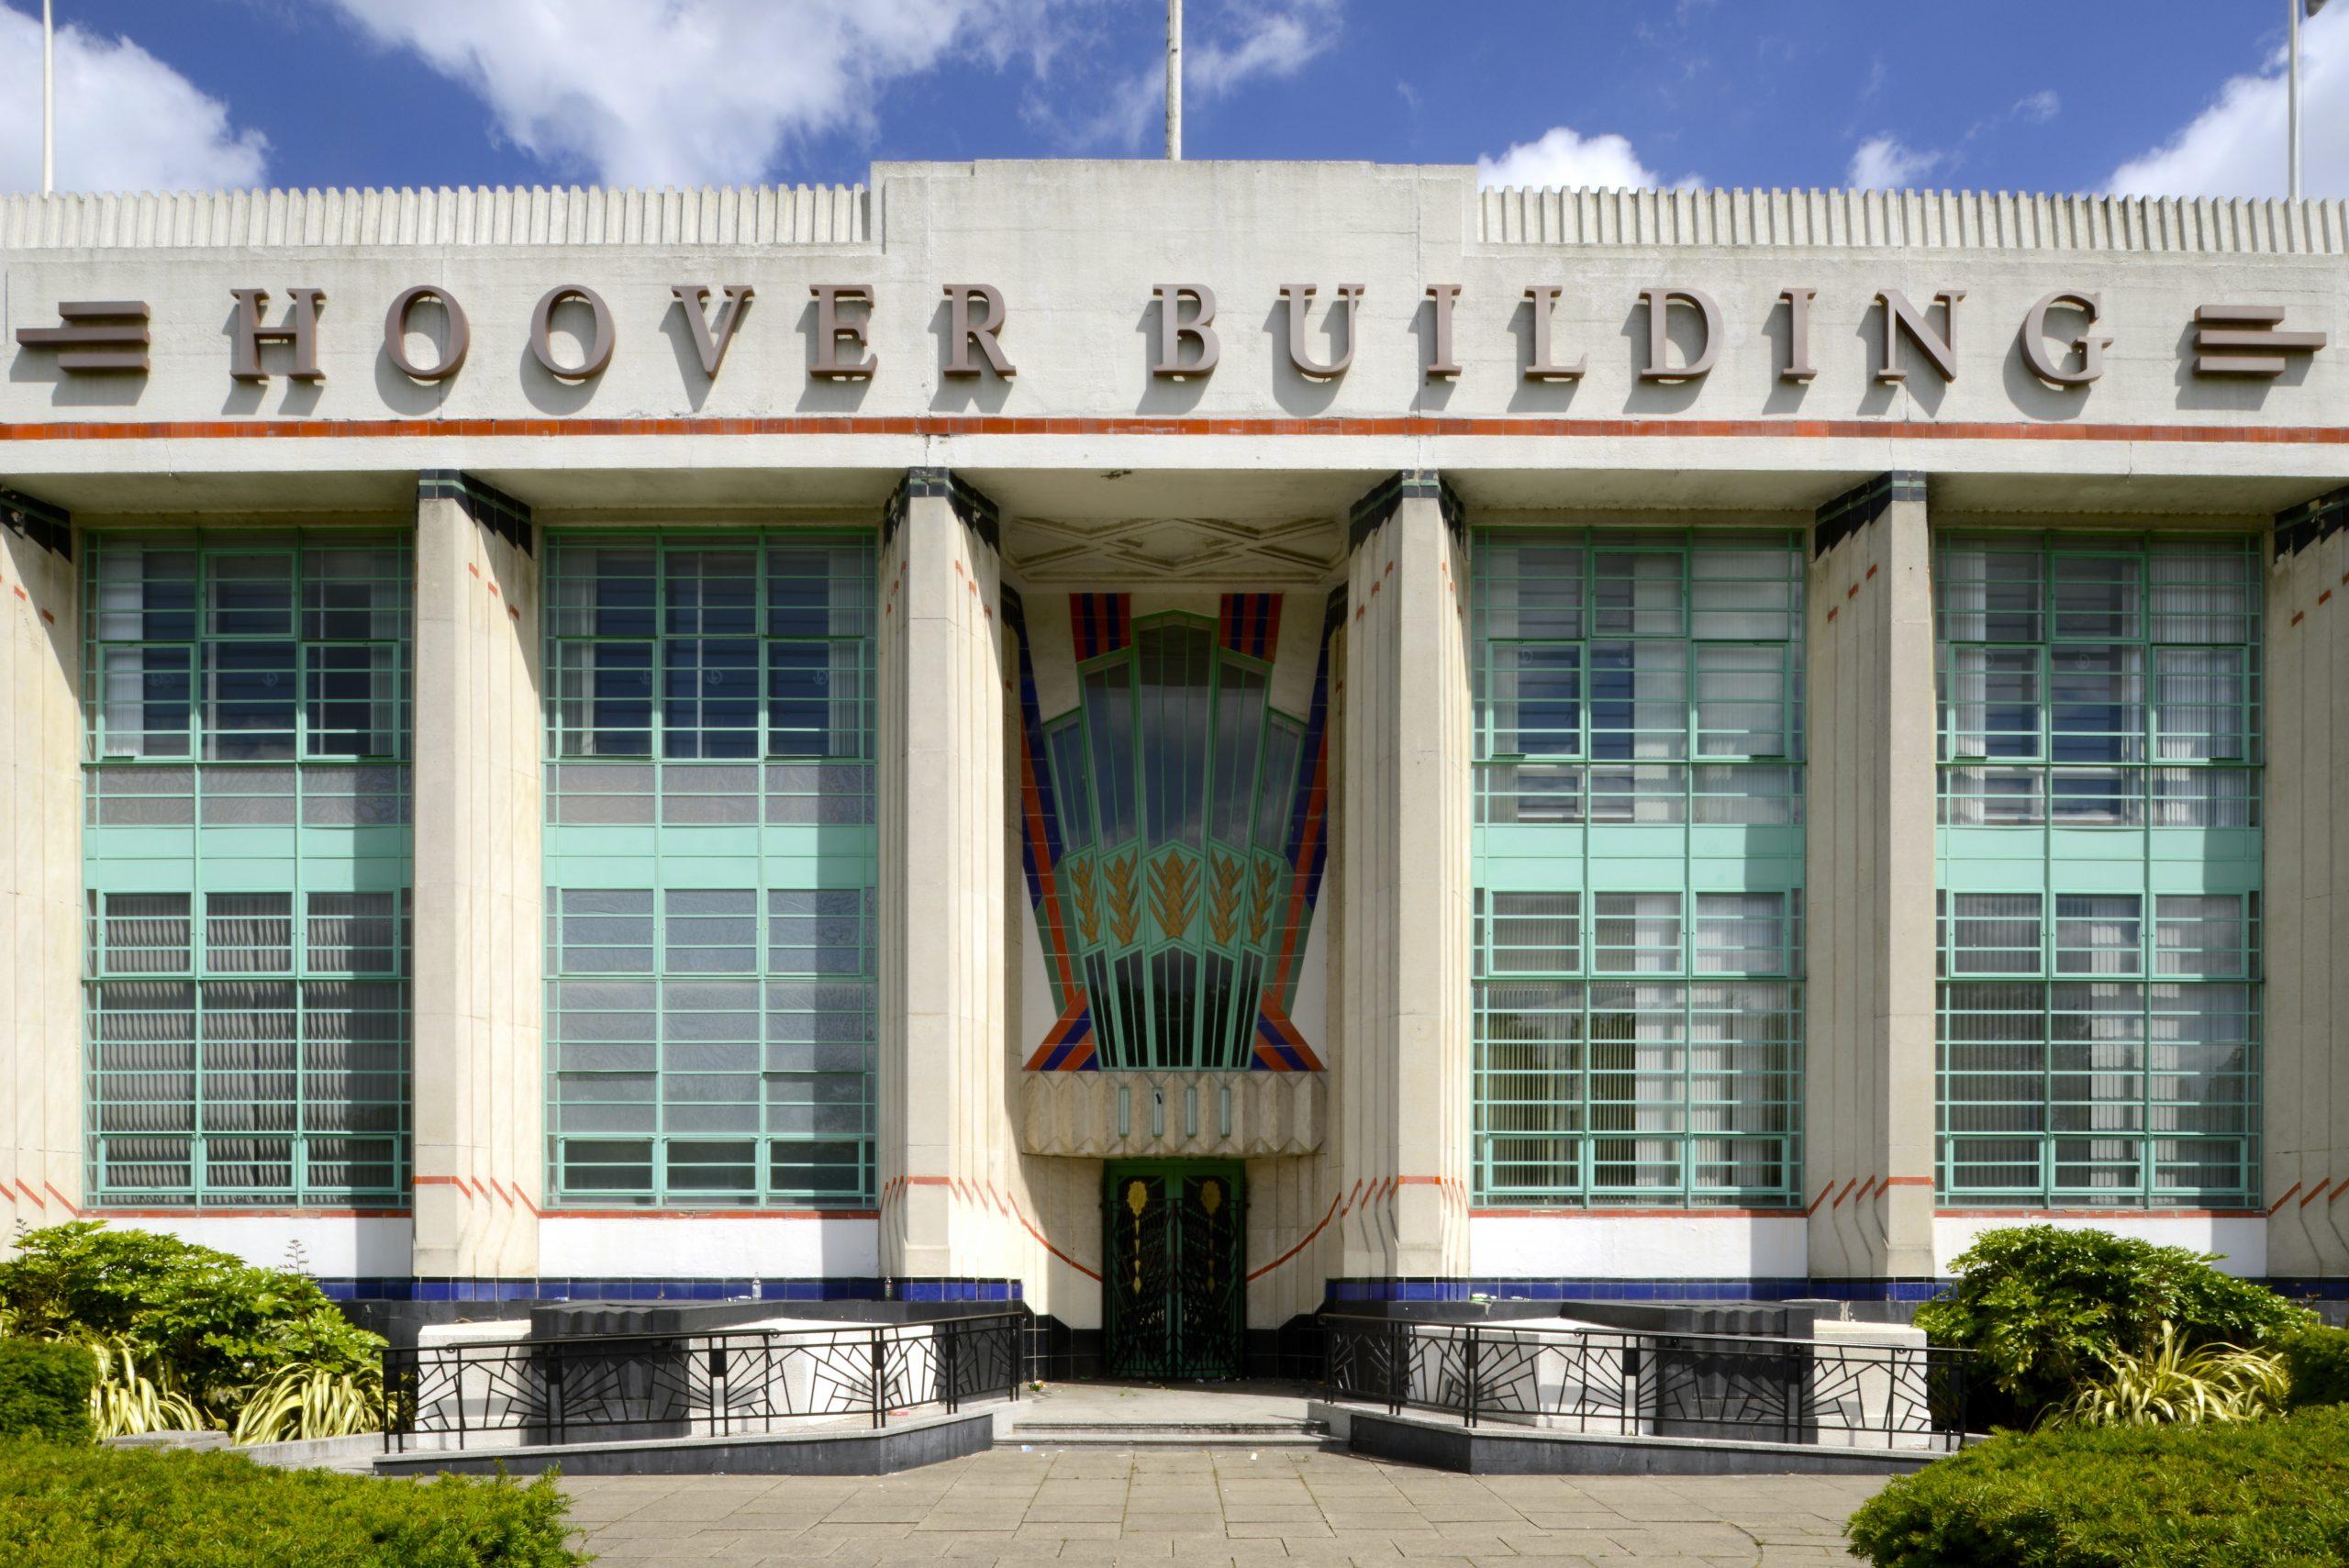 Hoover Building. Image Elain Harwood